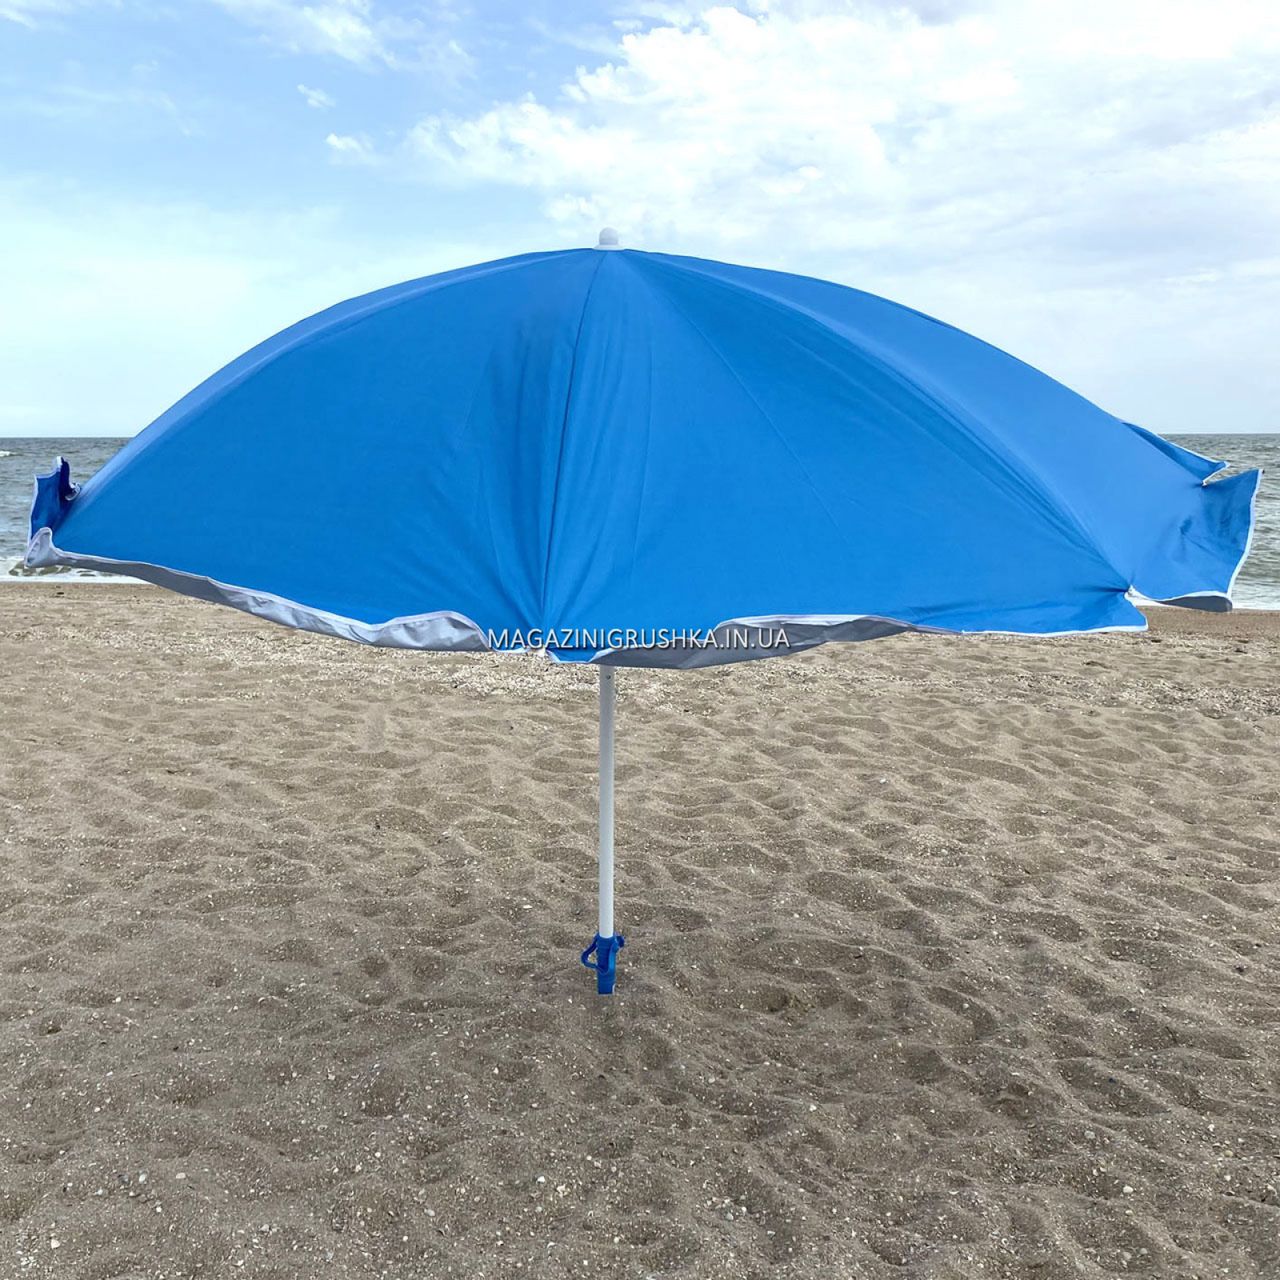 Зонт пляжный (диаметр - 1.8 м) - серебро, синий (МН-2686)